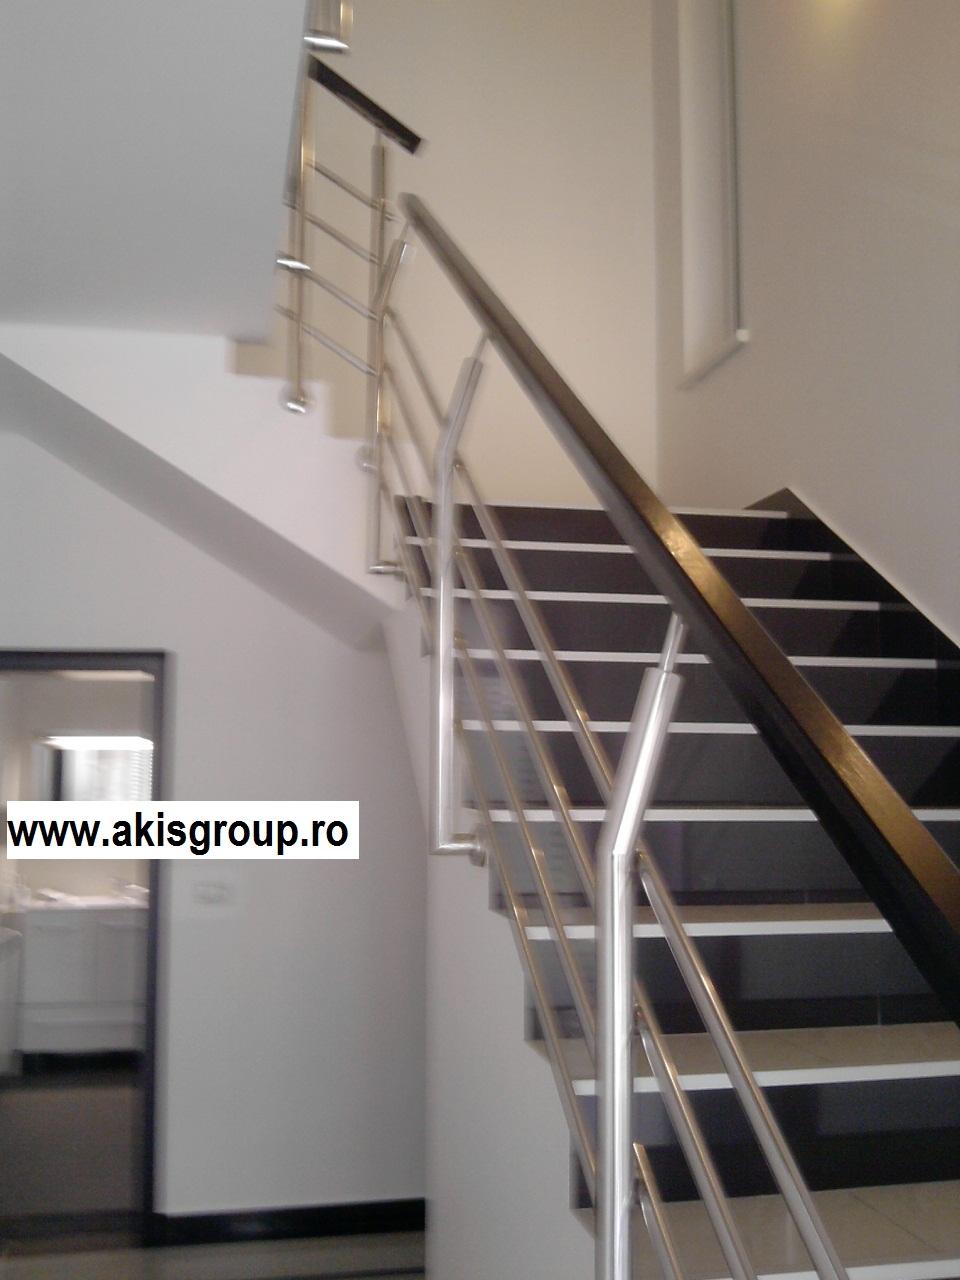 balustrade inox modele balustrade inox. Black Bedroom Furniture Sets. Home Design Ideas